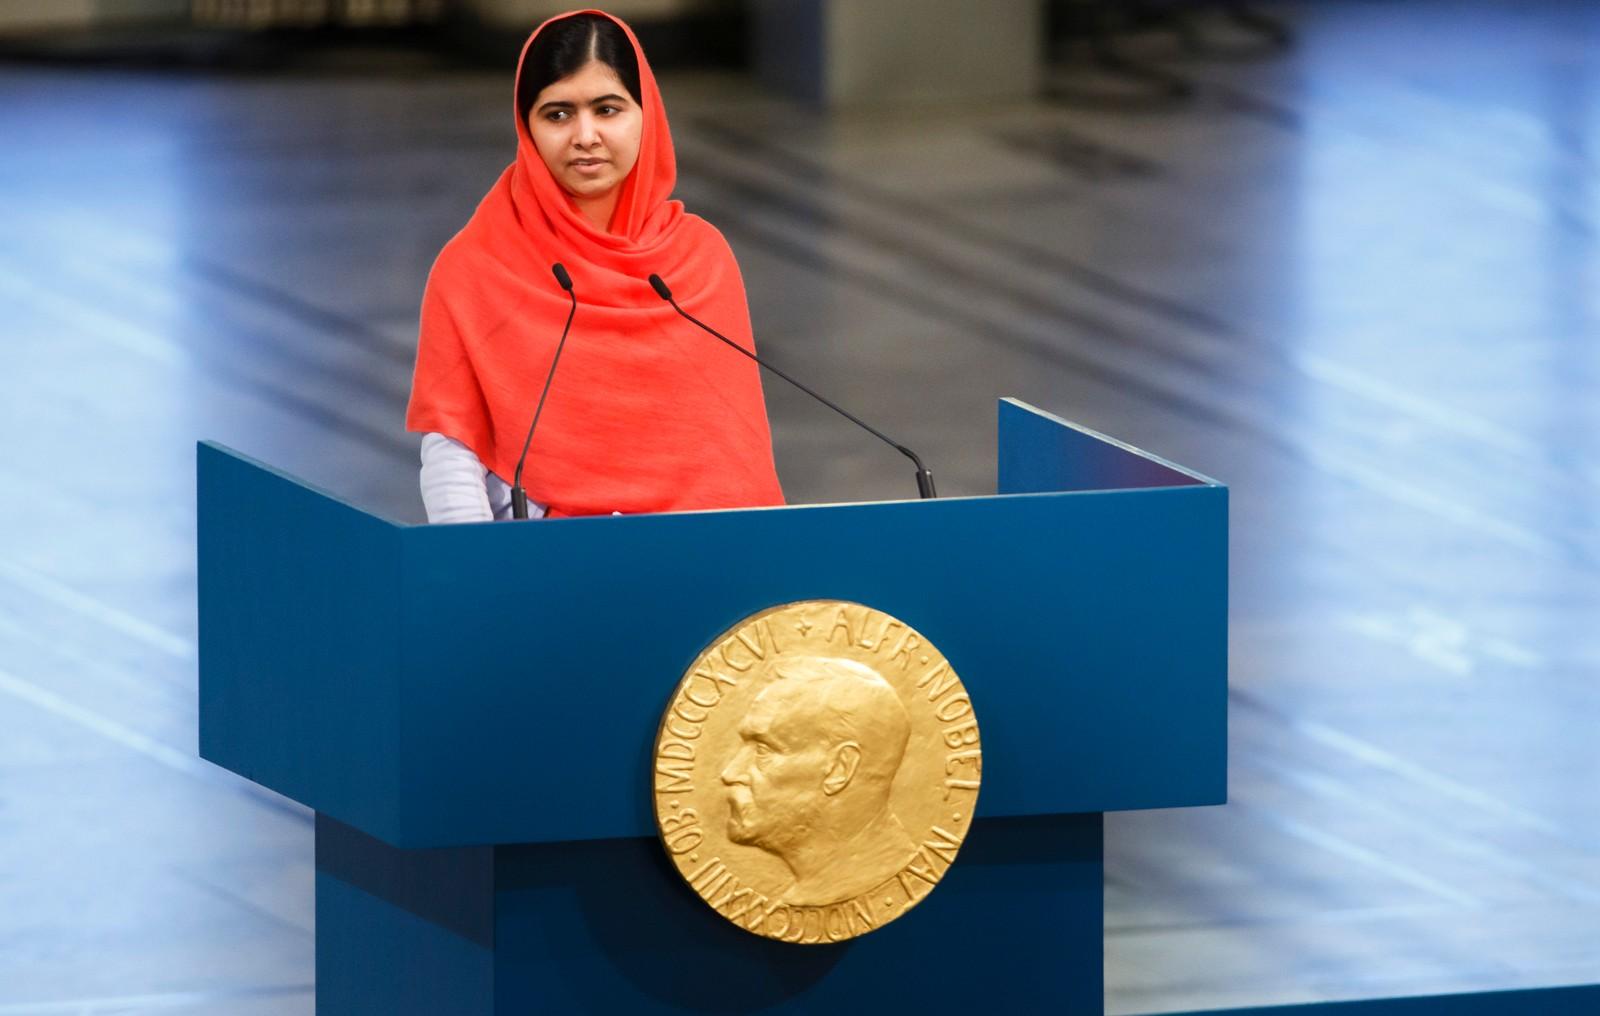 IKKE FOR UNG: Malala Yousafzai holder sin svært sterke fredspristale i Oslo rådhus onsdag ettermiddag.